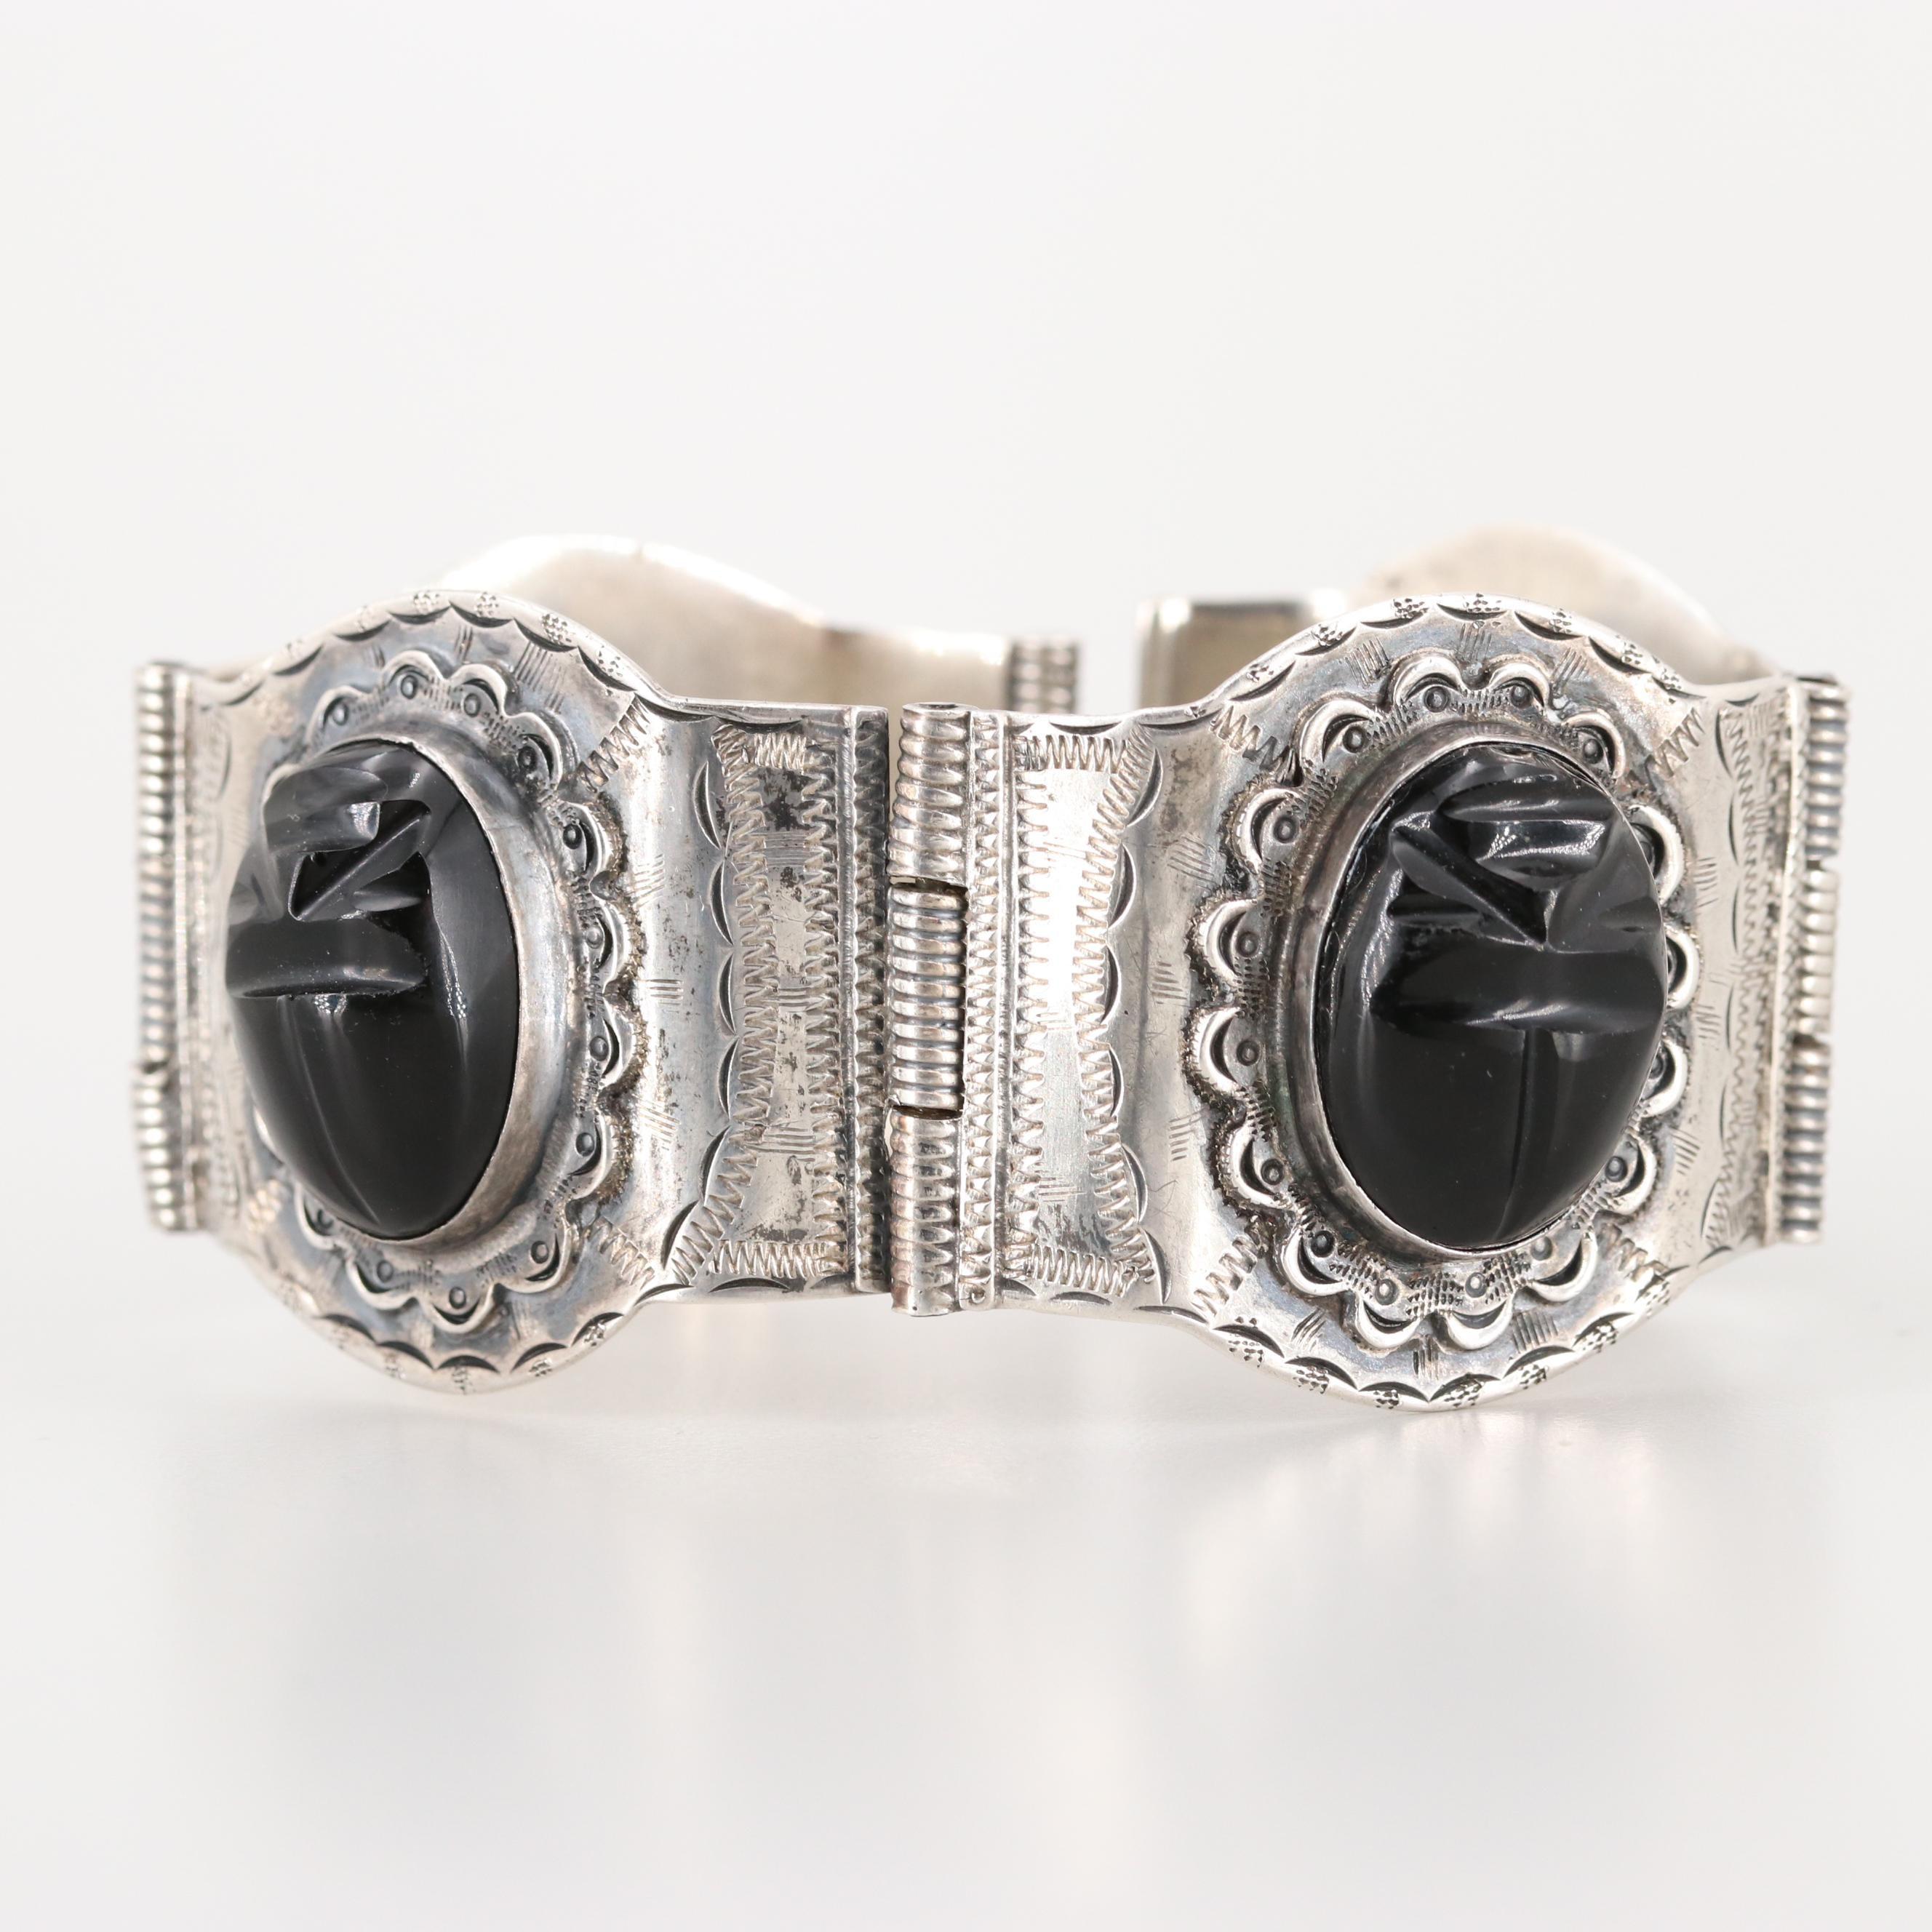 Mexican Sterling Silver Carved Obsidian Paneled Bracelet